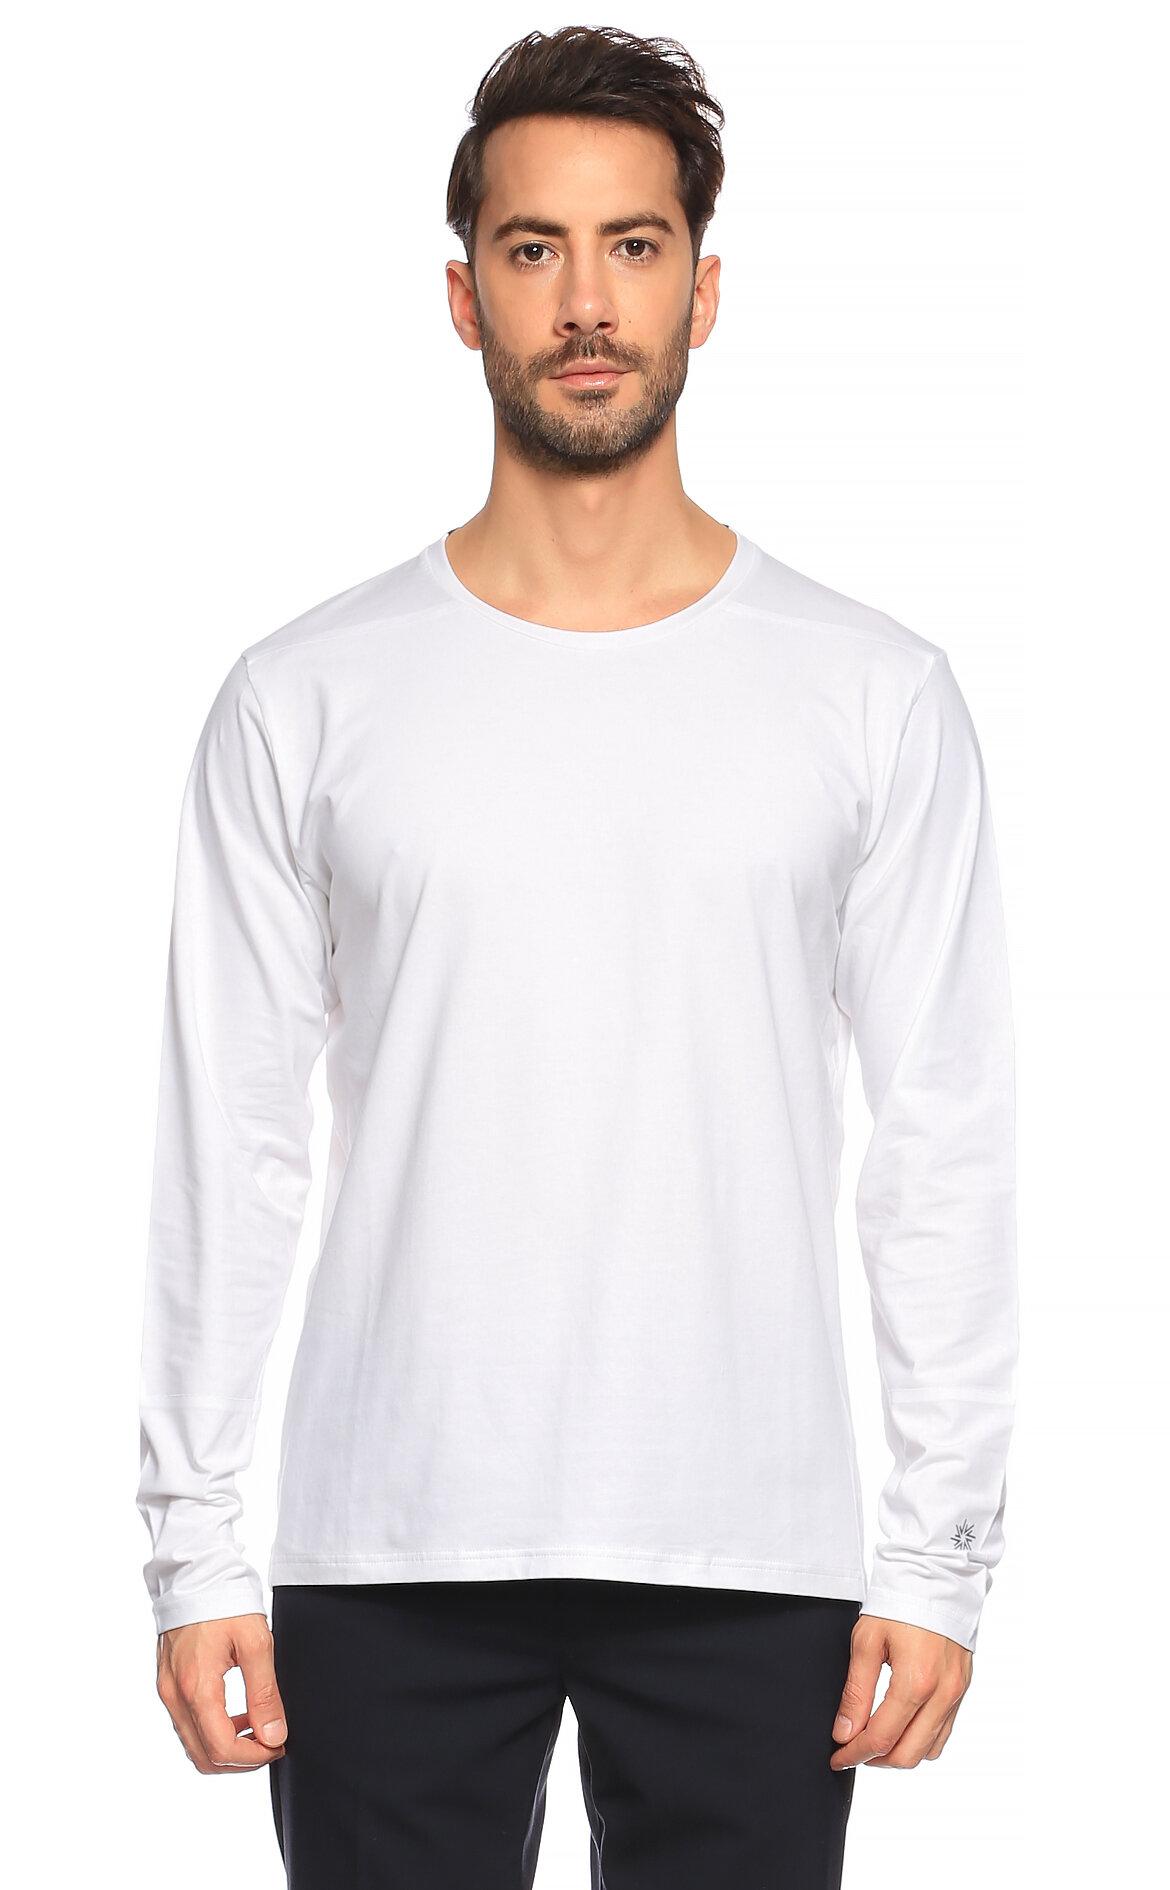 Isaora-Isaora Uzun Kollu Beyaz T-Shirt